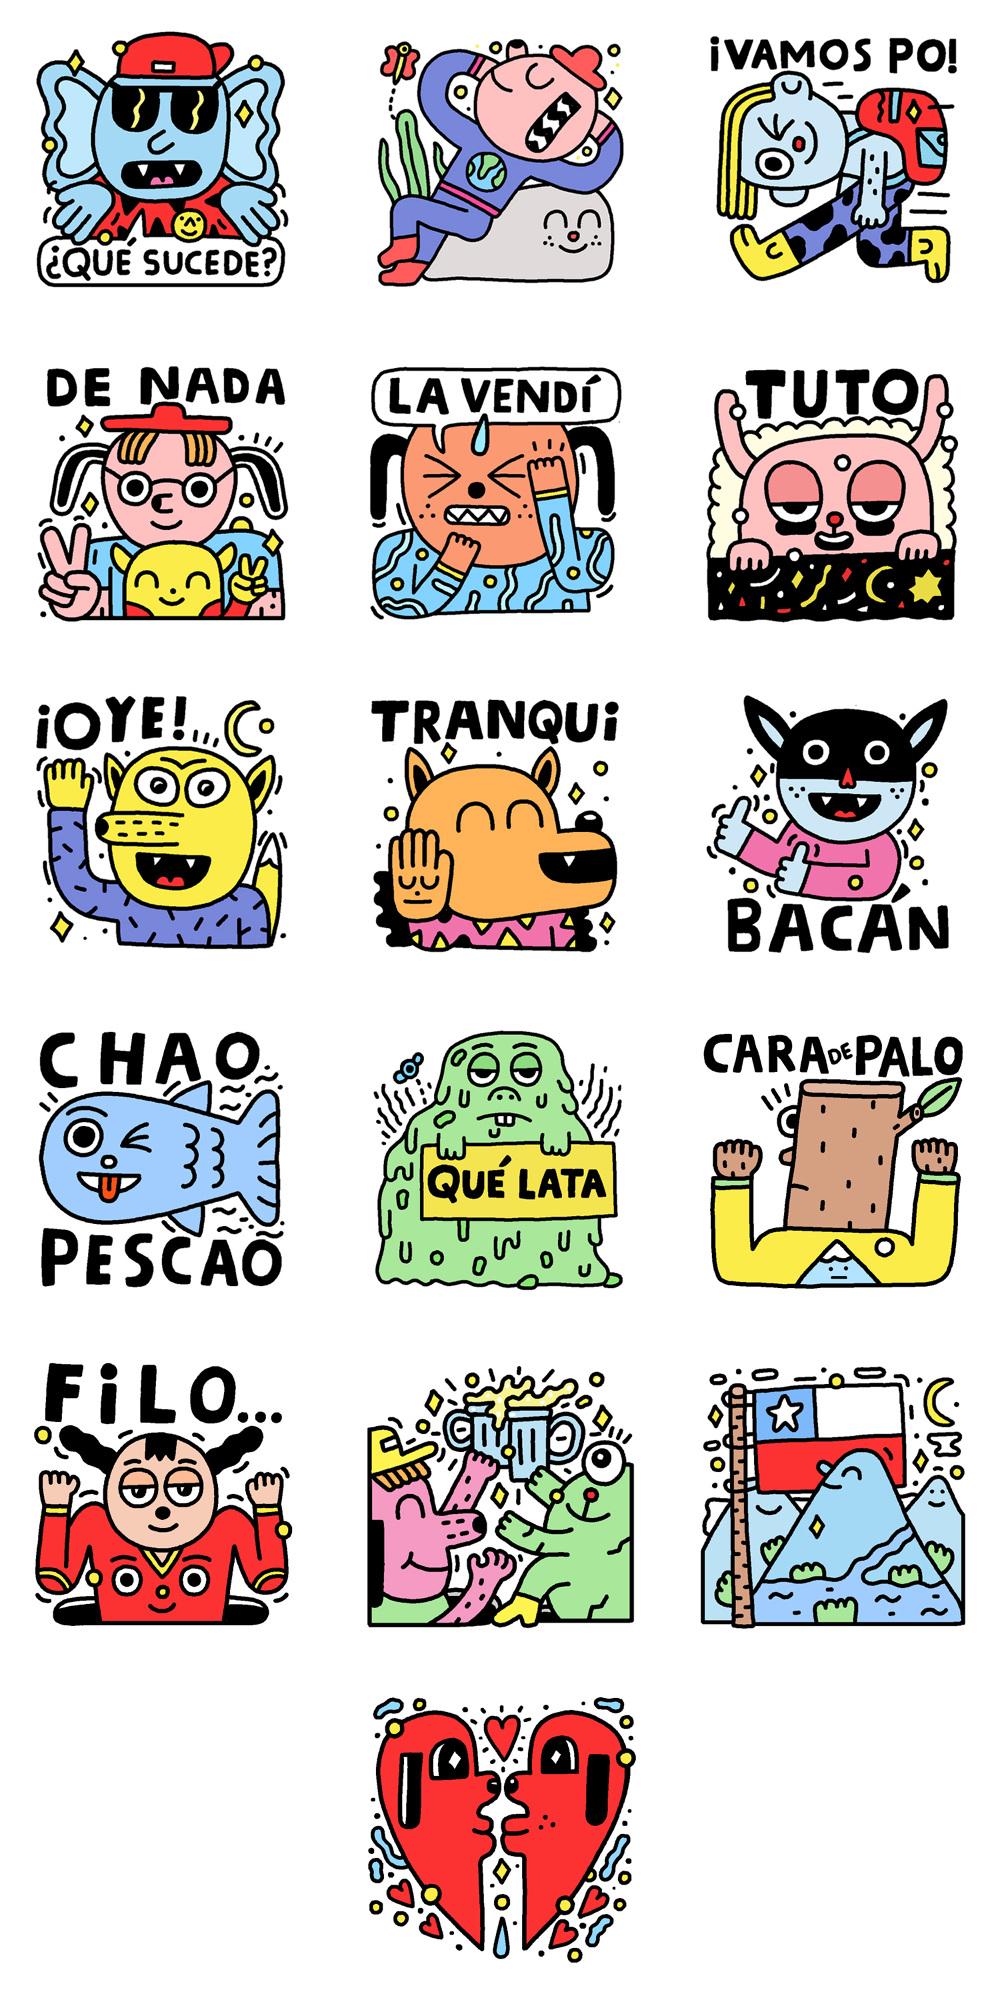 Take it easy - Stickers for Facebook - Pablo Delcielo